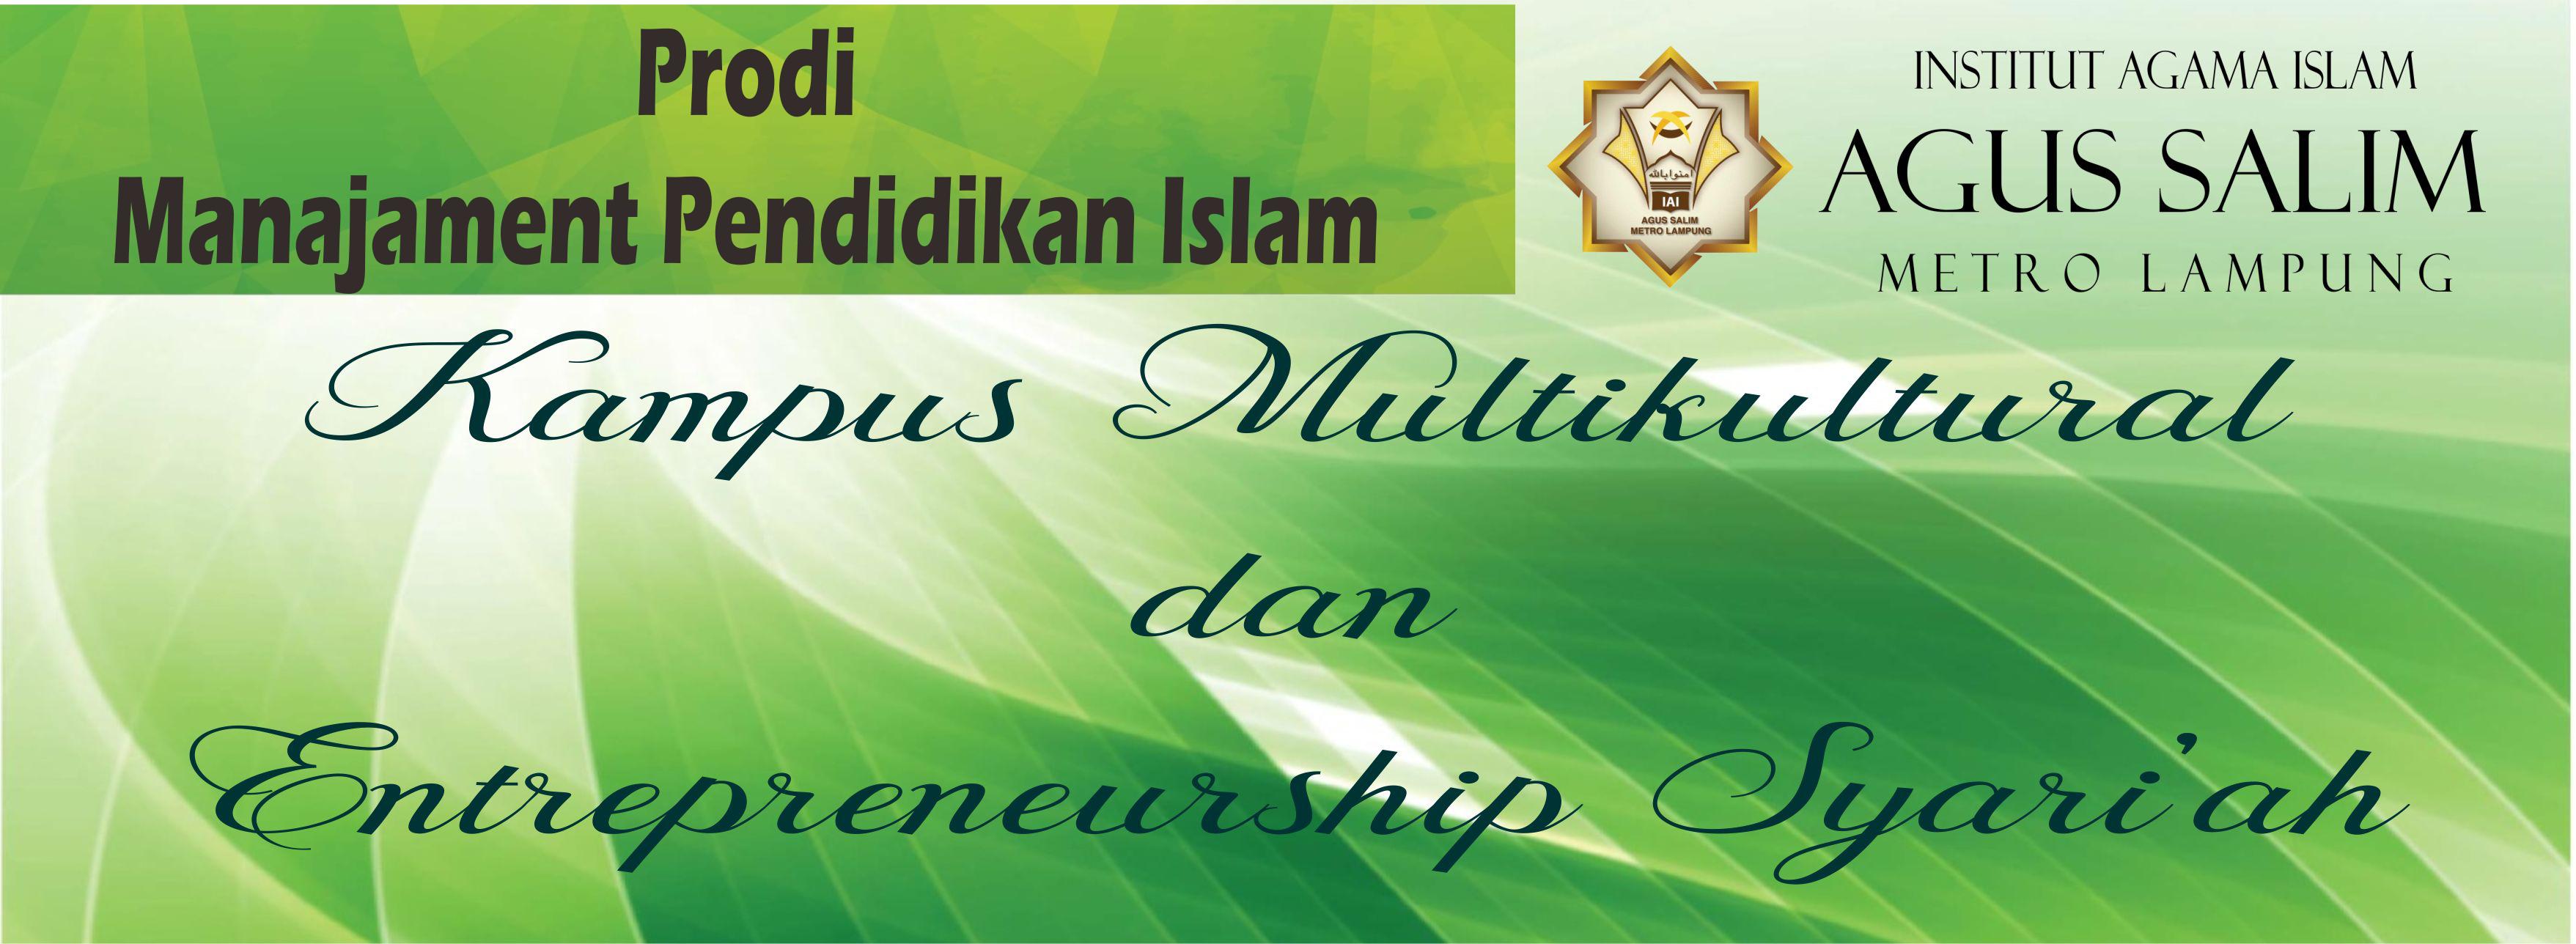 Manajament Pendidikan Islam